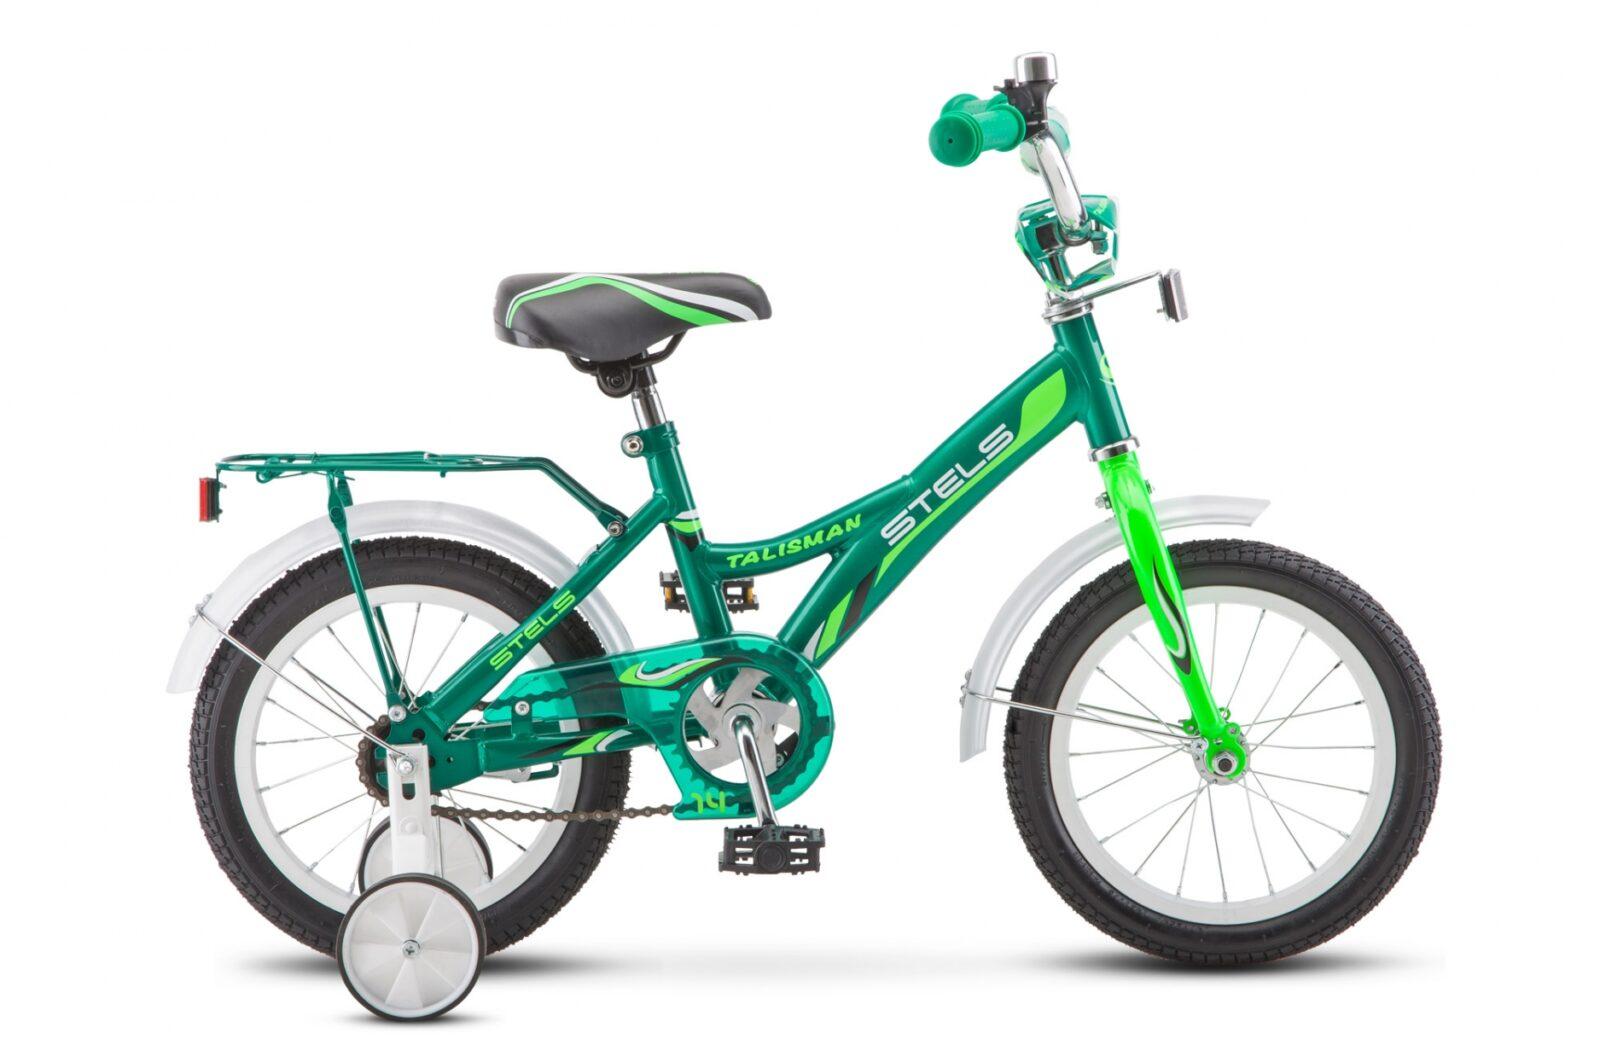 Велосипед Stels Talisman 14 Z010 (2018)